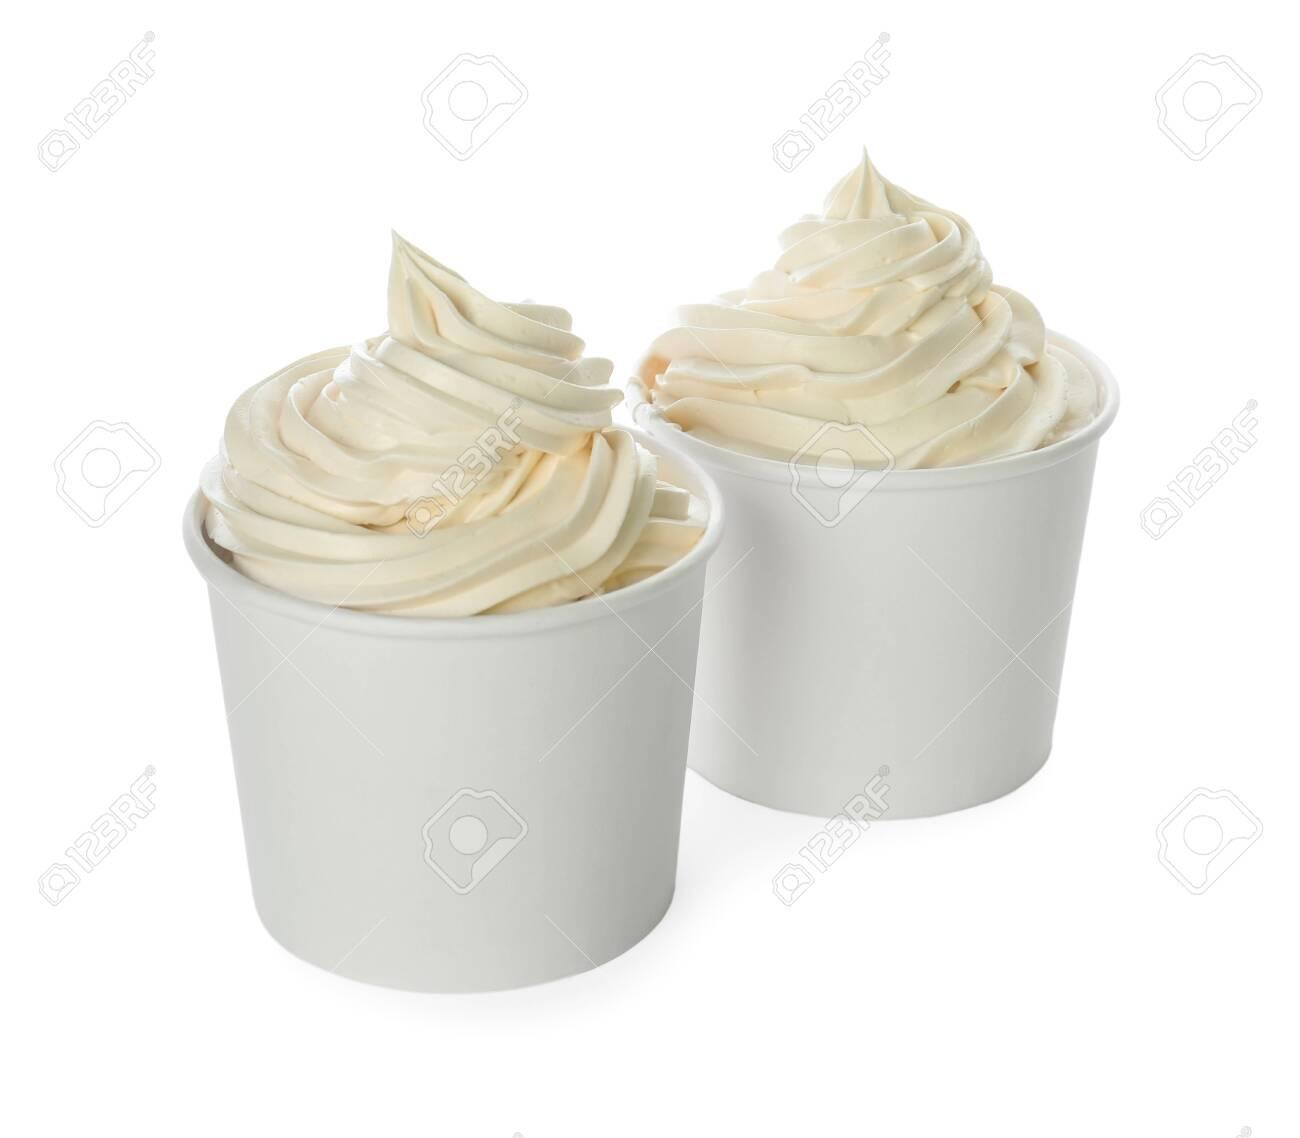 Cups with tasty frozen yogurt on white background - 131578134